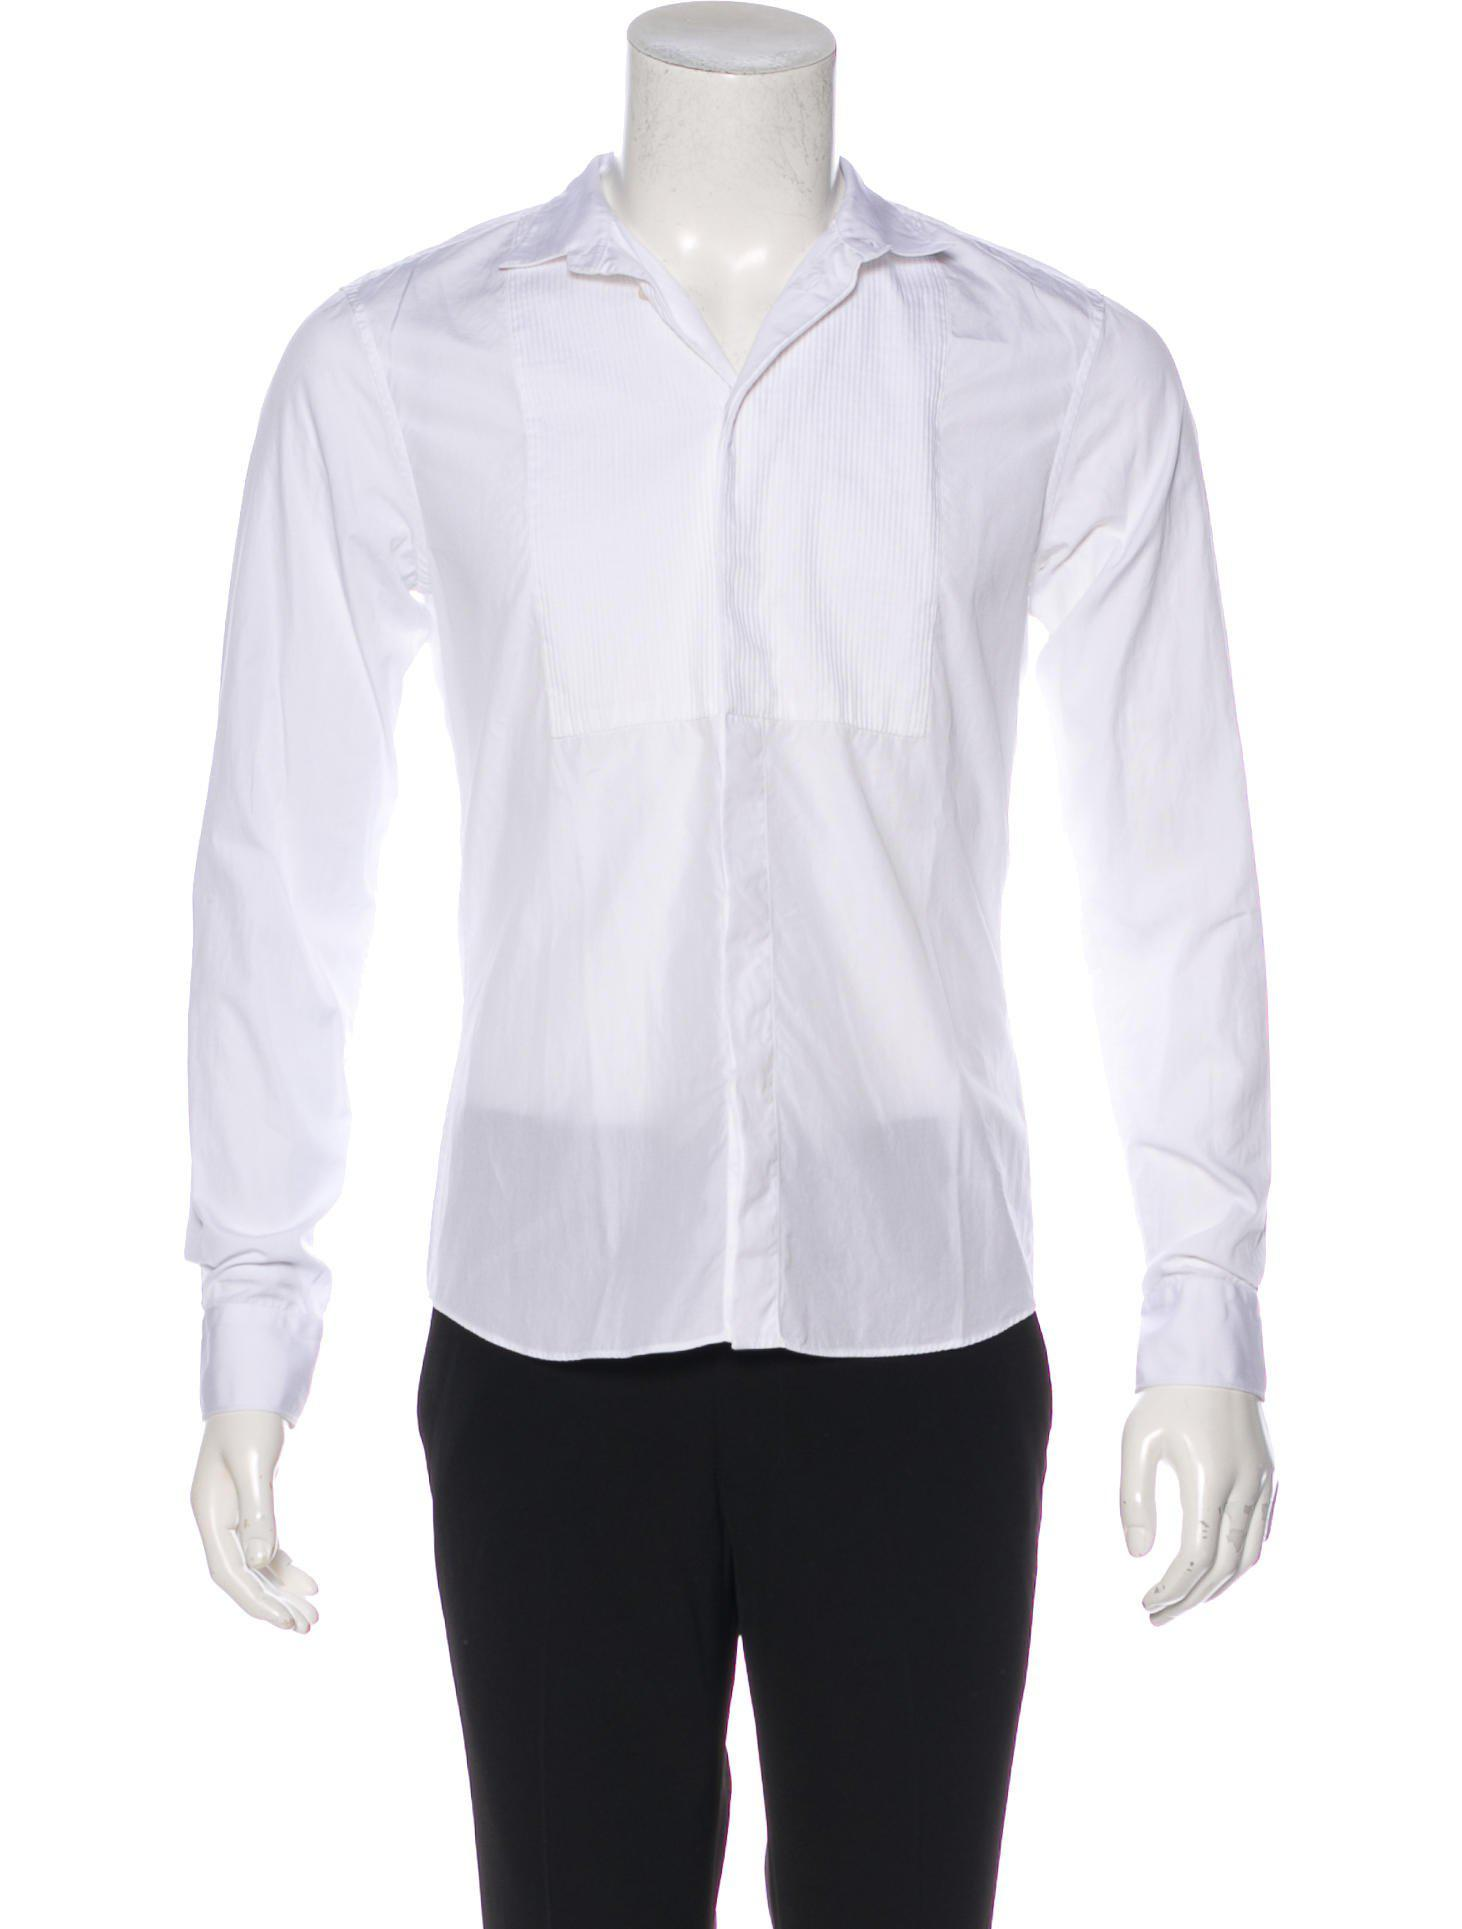 52c2fc97d8bc75 Givenchy - White 2016 Tuxedo Shirt for Men - Lyst. View fullscreen